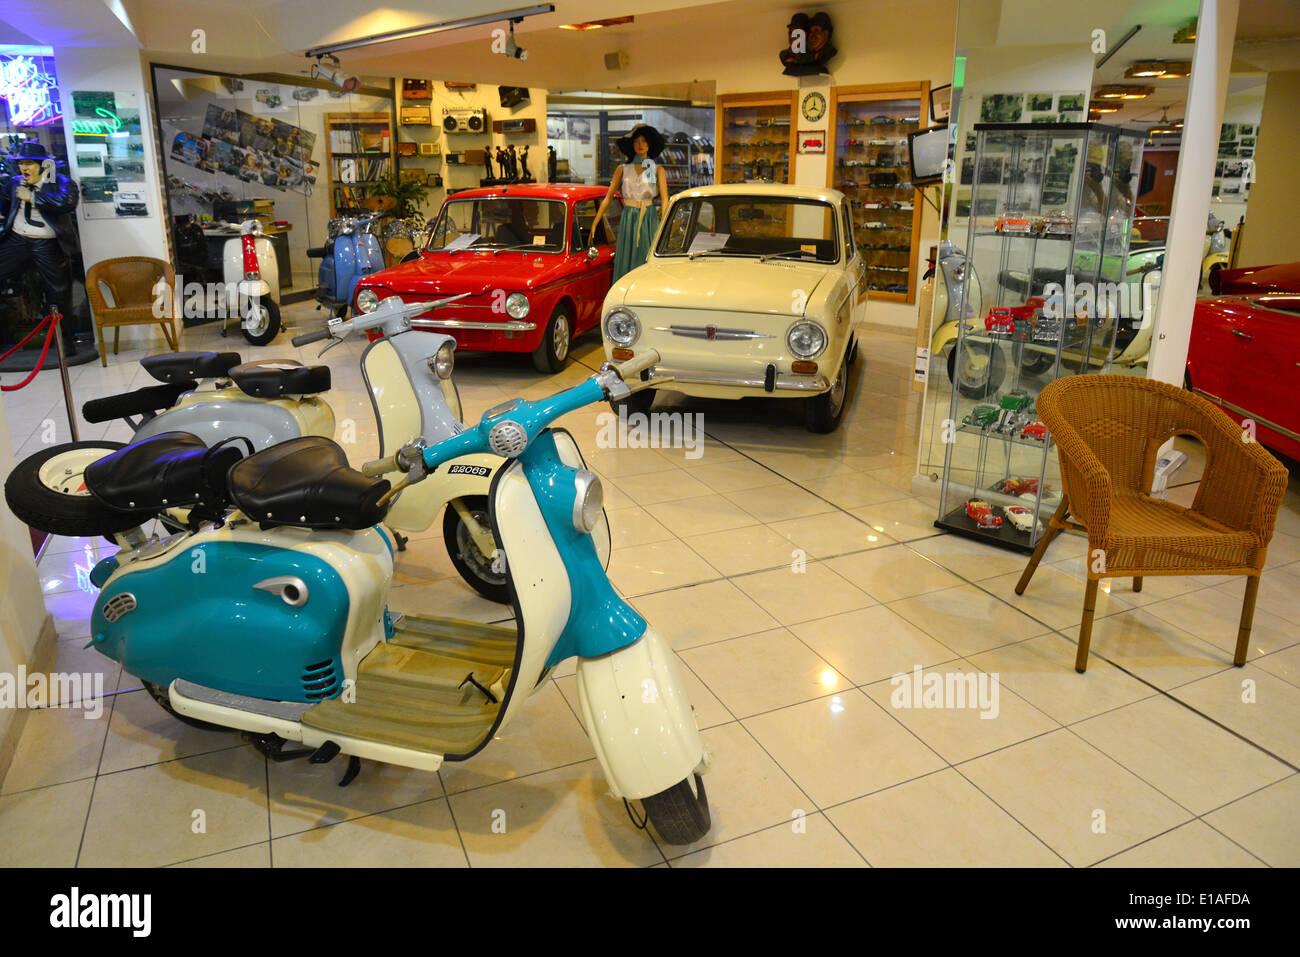 vespa scooters malta classic car museum qawra il qawra saint stock photo royalty free. Black Bedroom Furniture Sets. Home Design Ideas